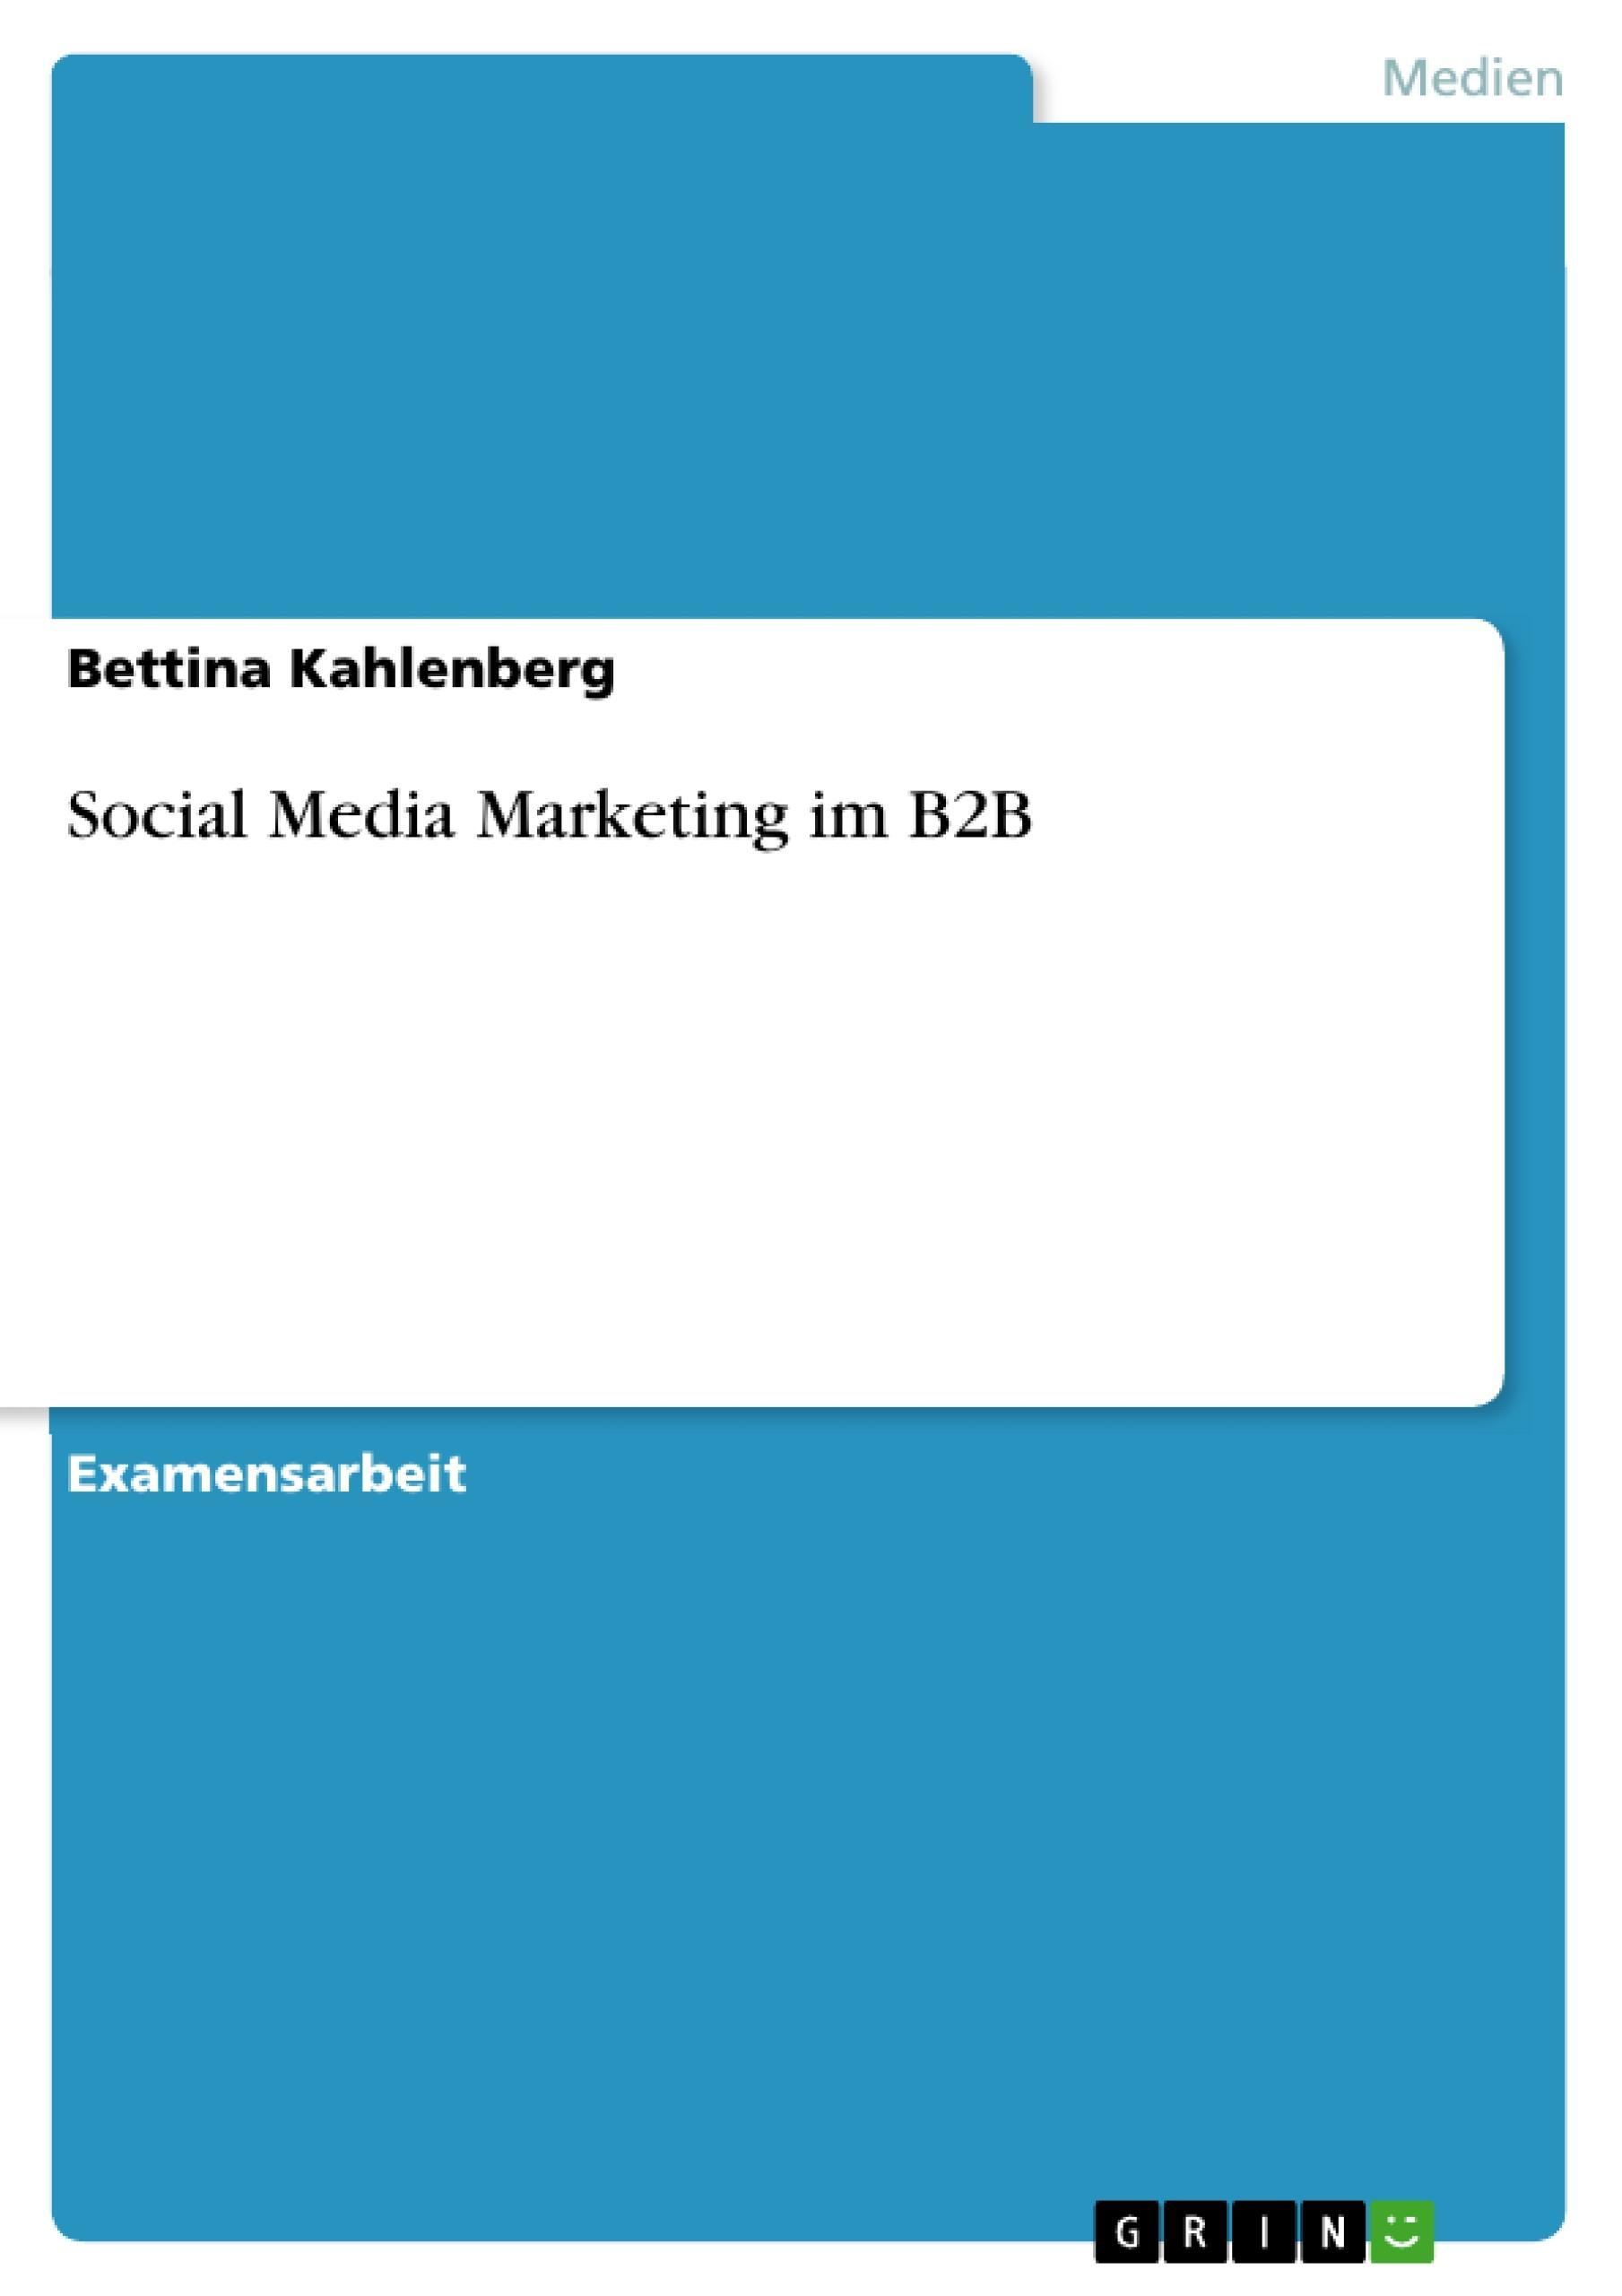 Social Media Marketing im B2B Bettina Kahlenberg